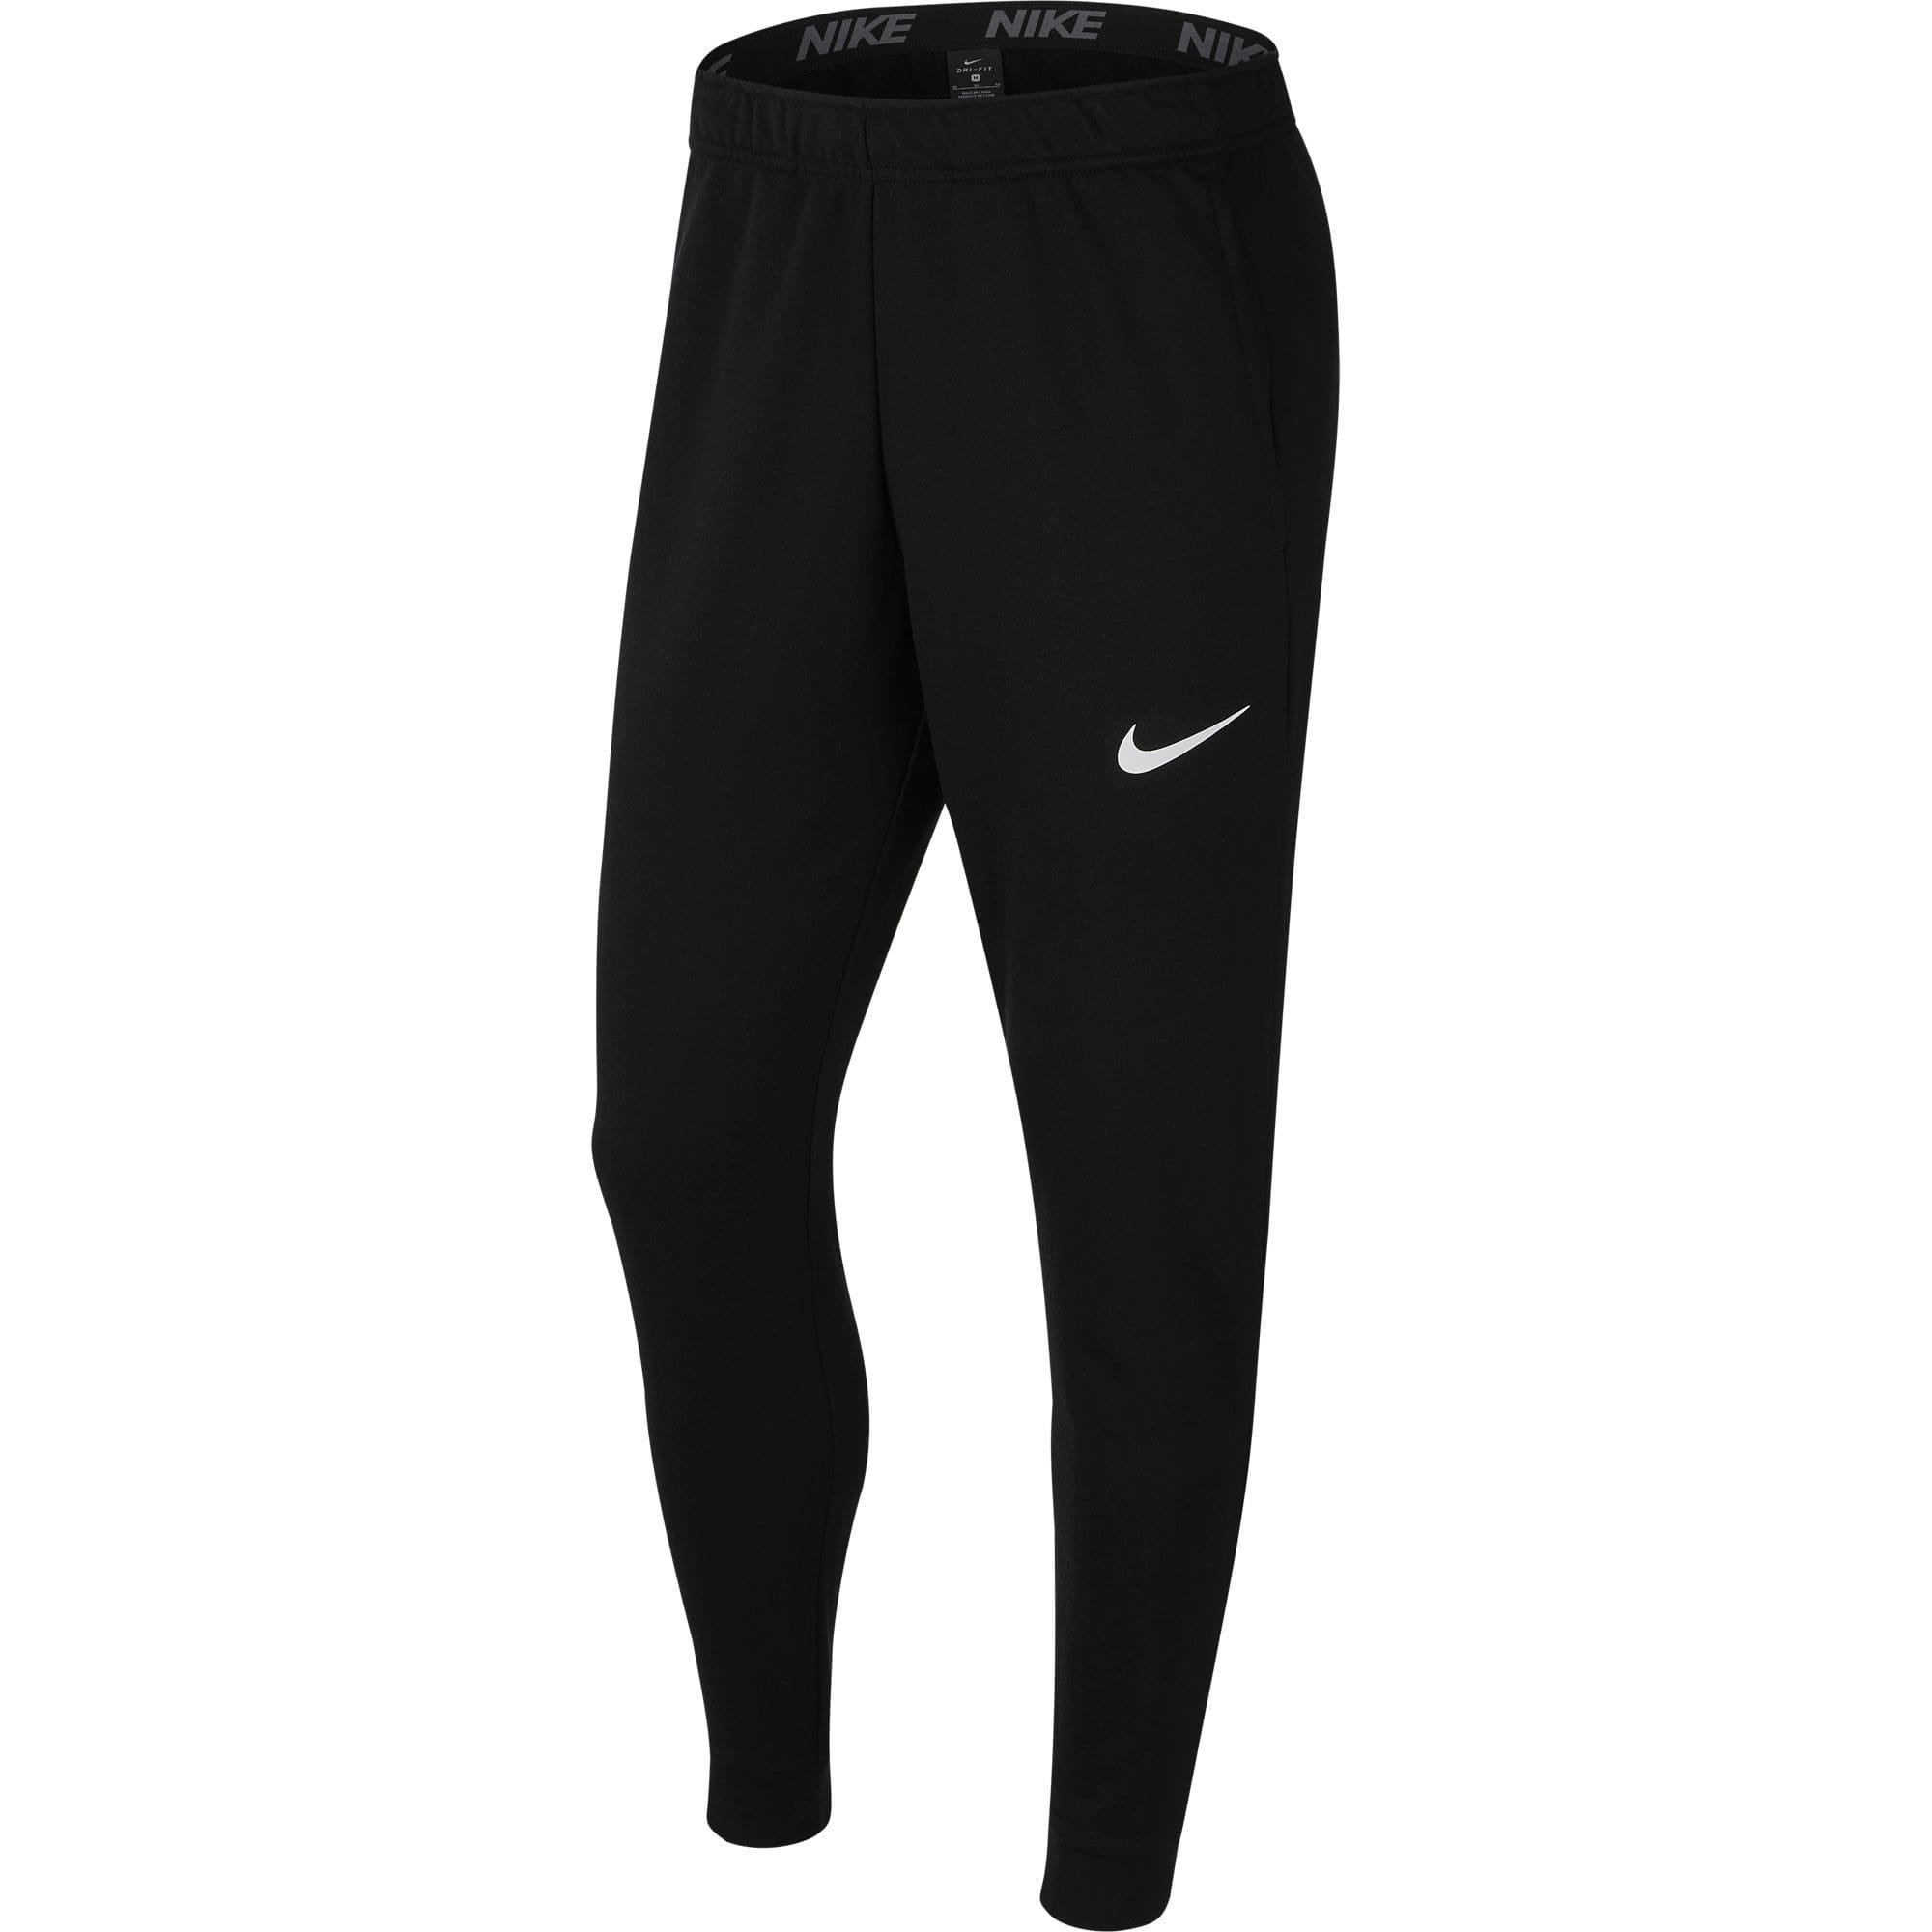 Nike Nk Dry miesten collegehousut